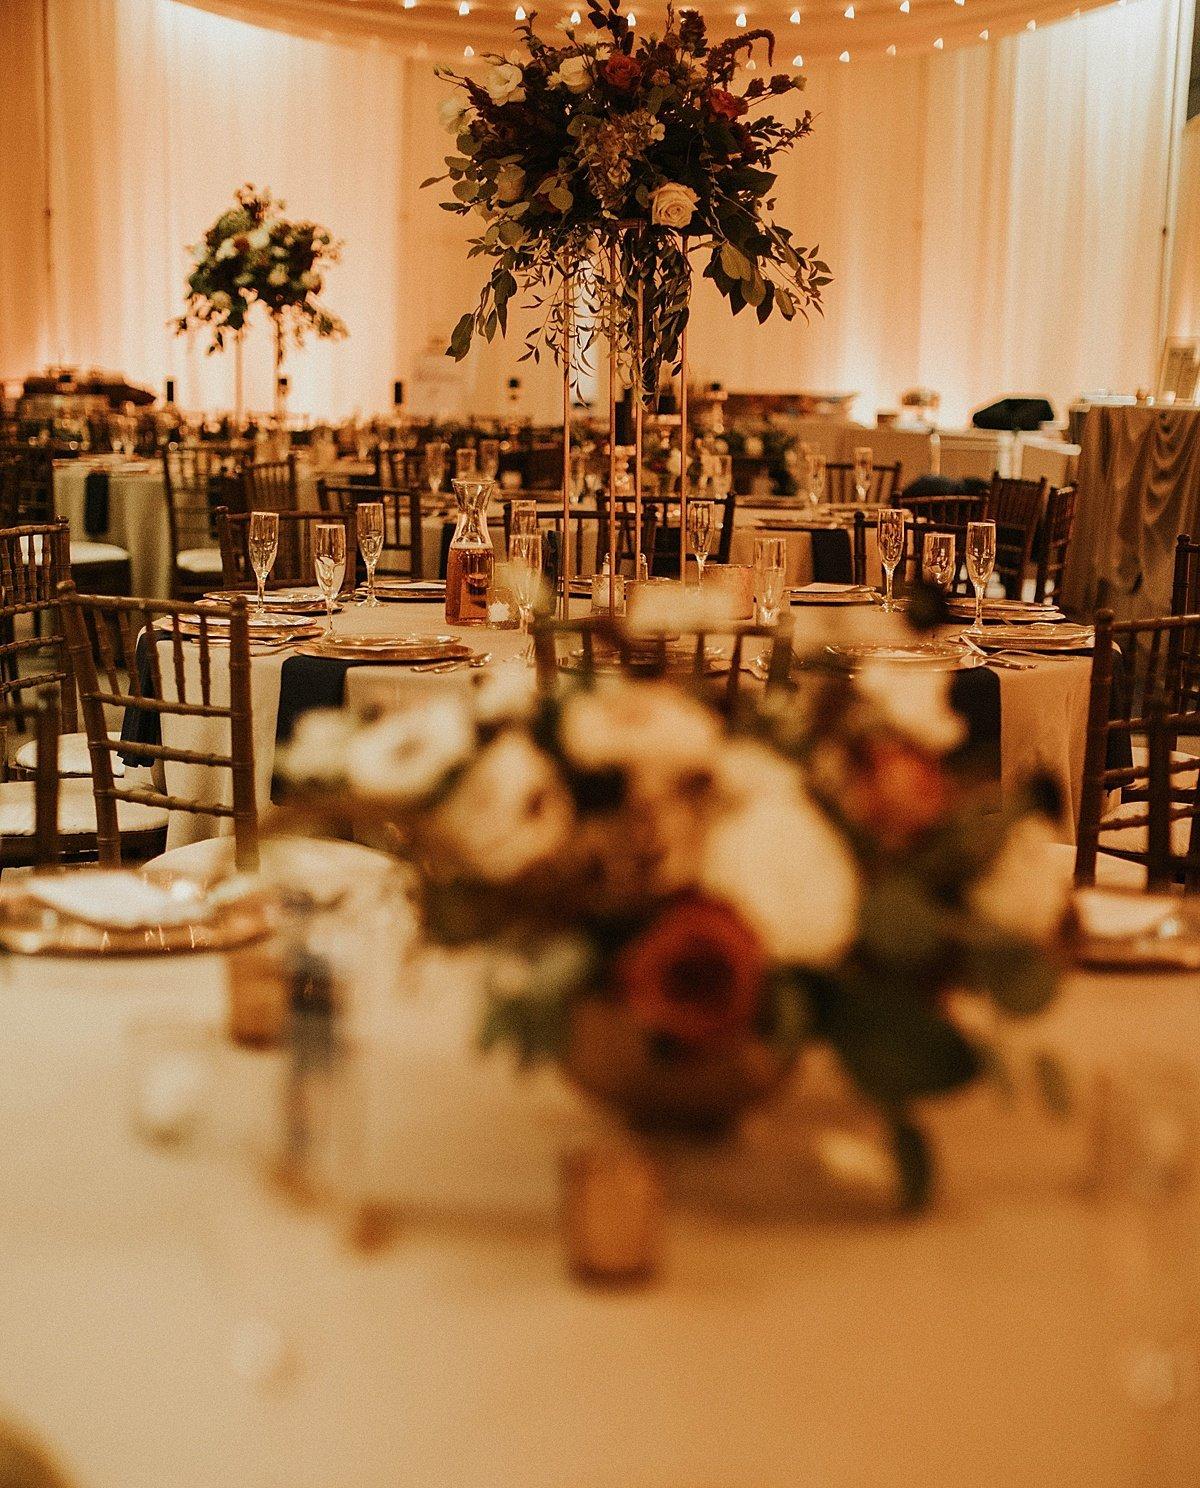 Wedding Flowers Omaha Ne: Floral Design And Wedding Planning Omaha